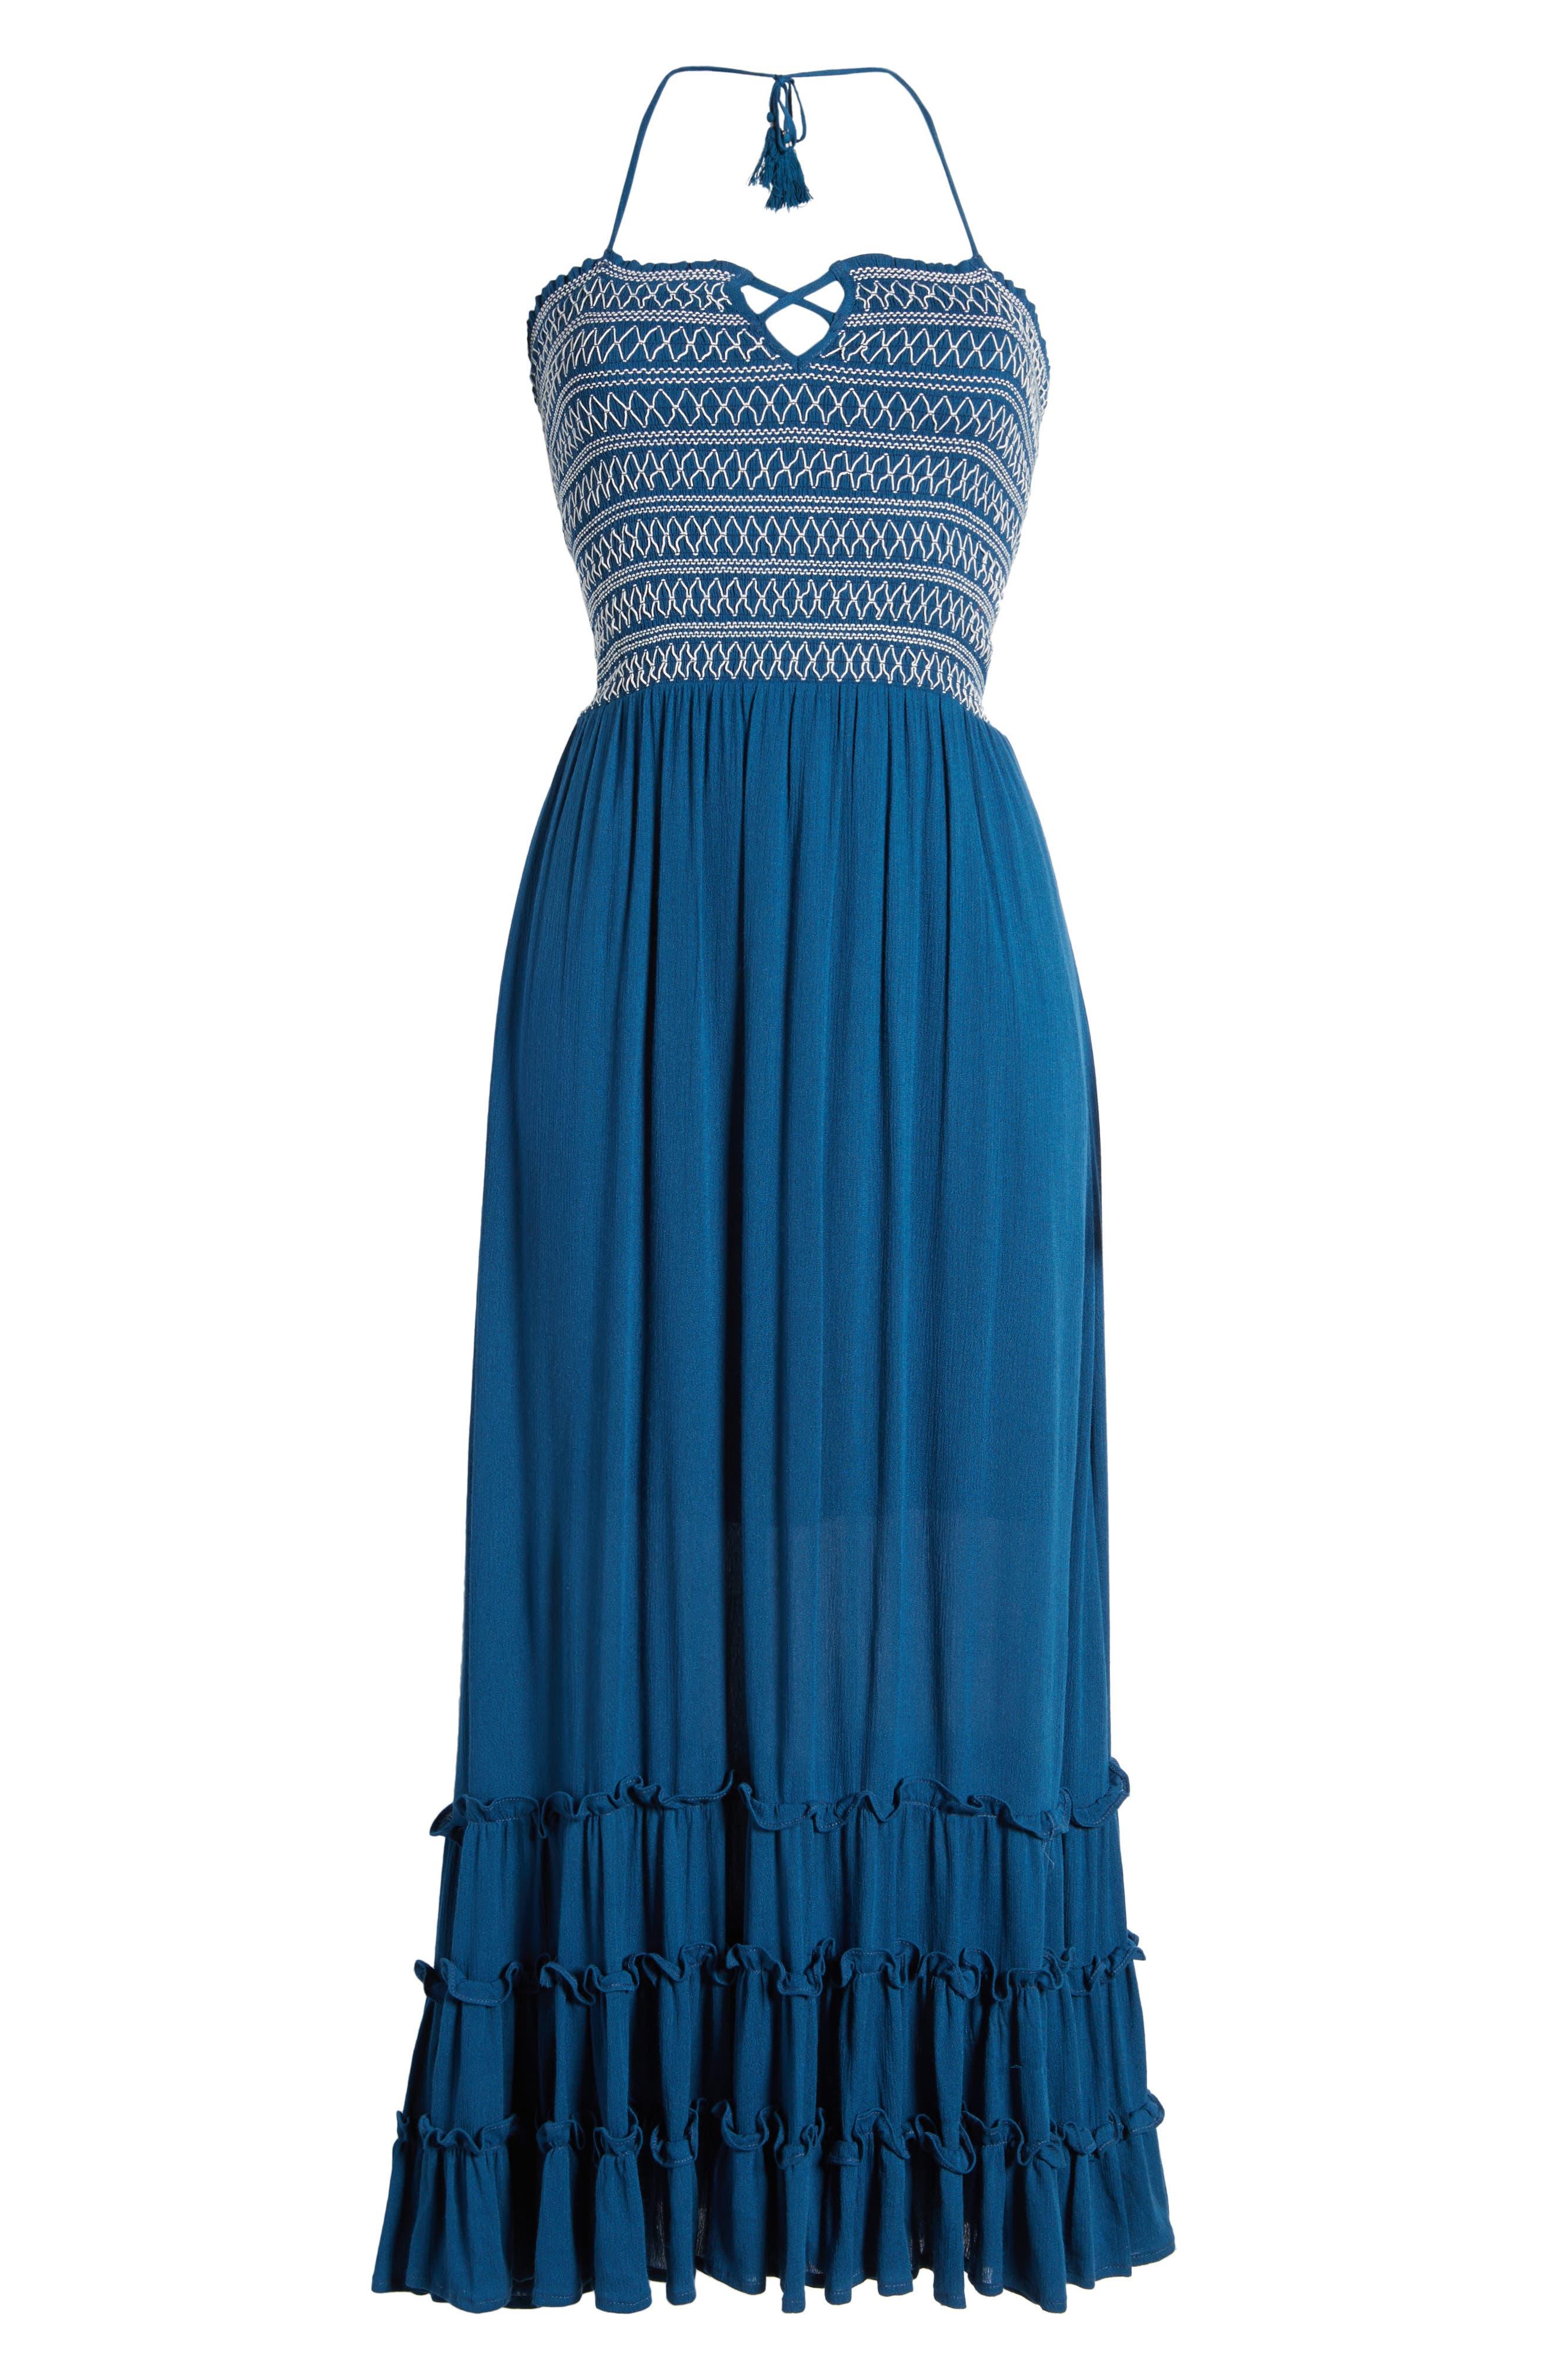 Sailor Smocked Maxi Dress,                             Alternate thumbnail 6, color,                             410